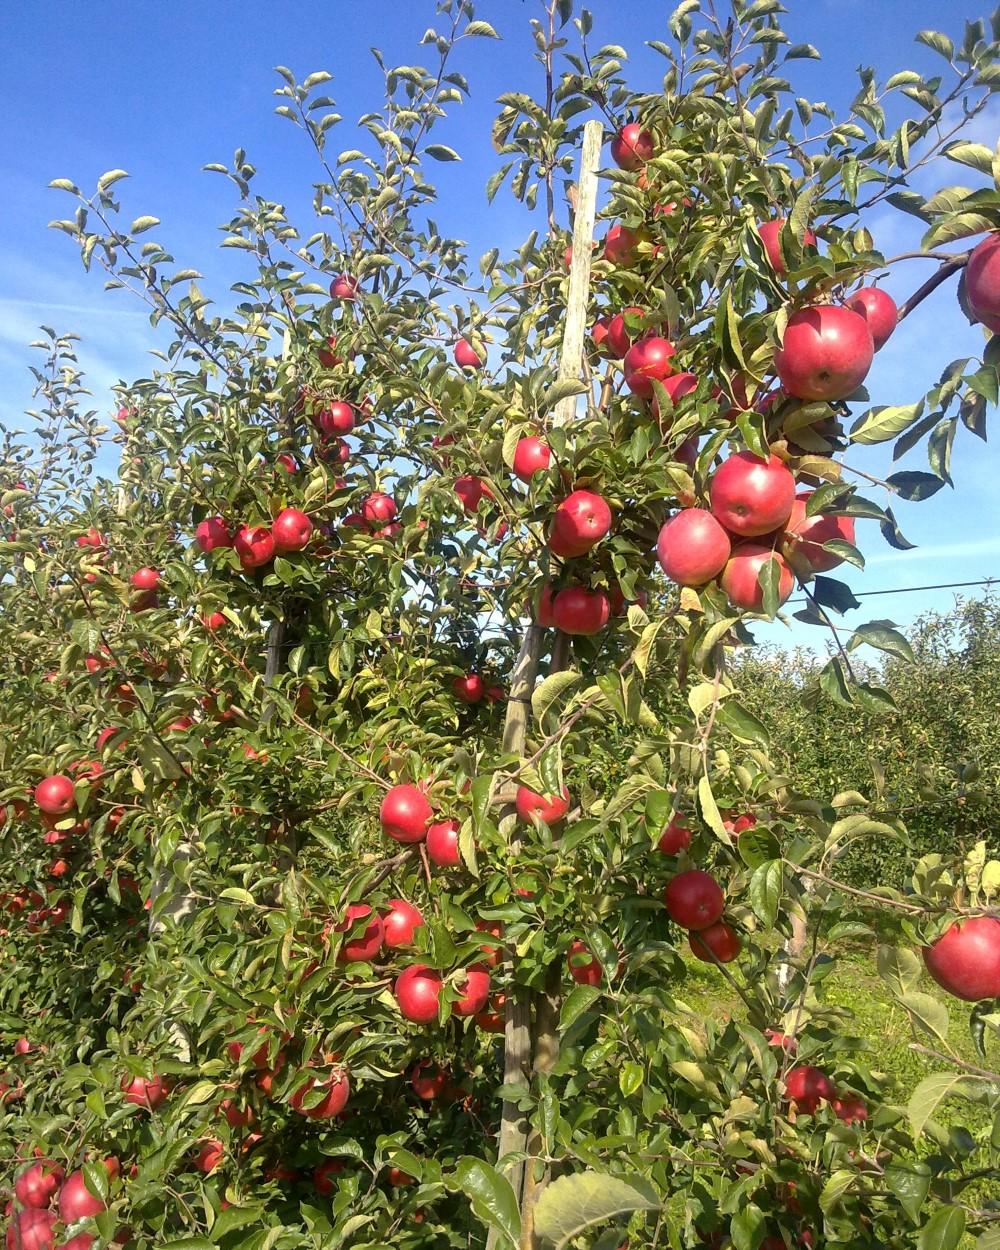 16012011433 - Obst & Gemüse aus Polen